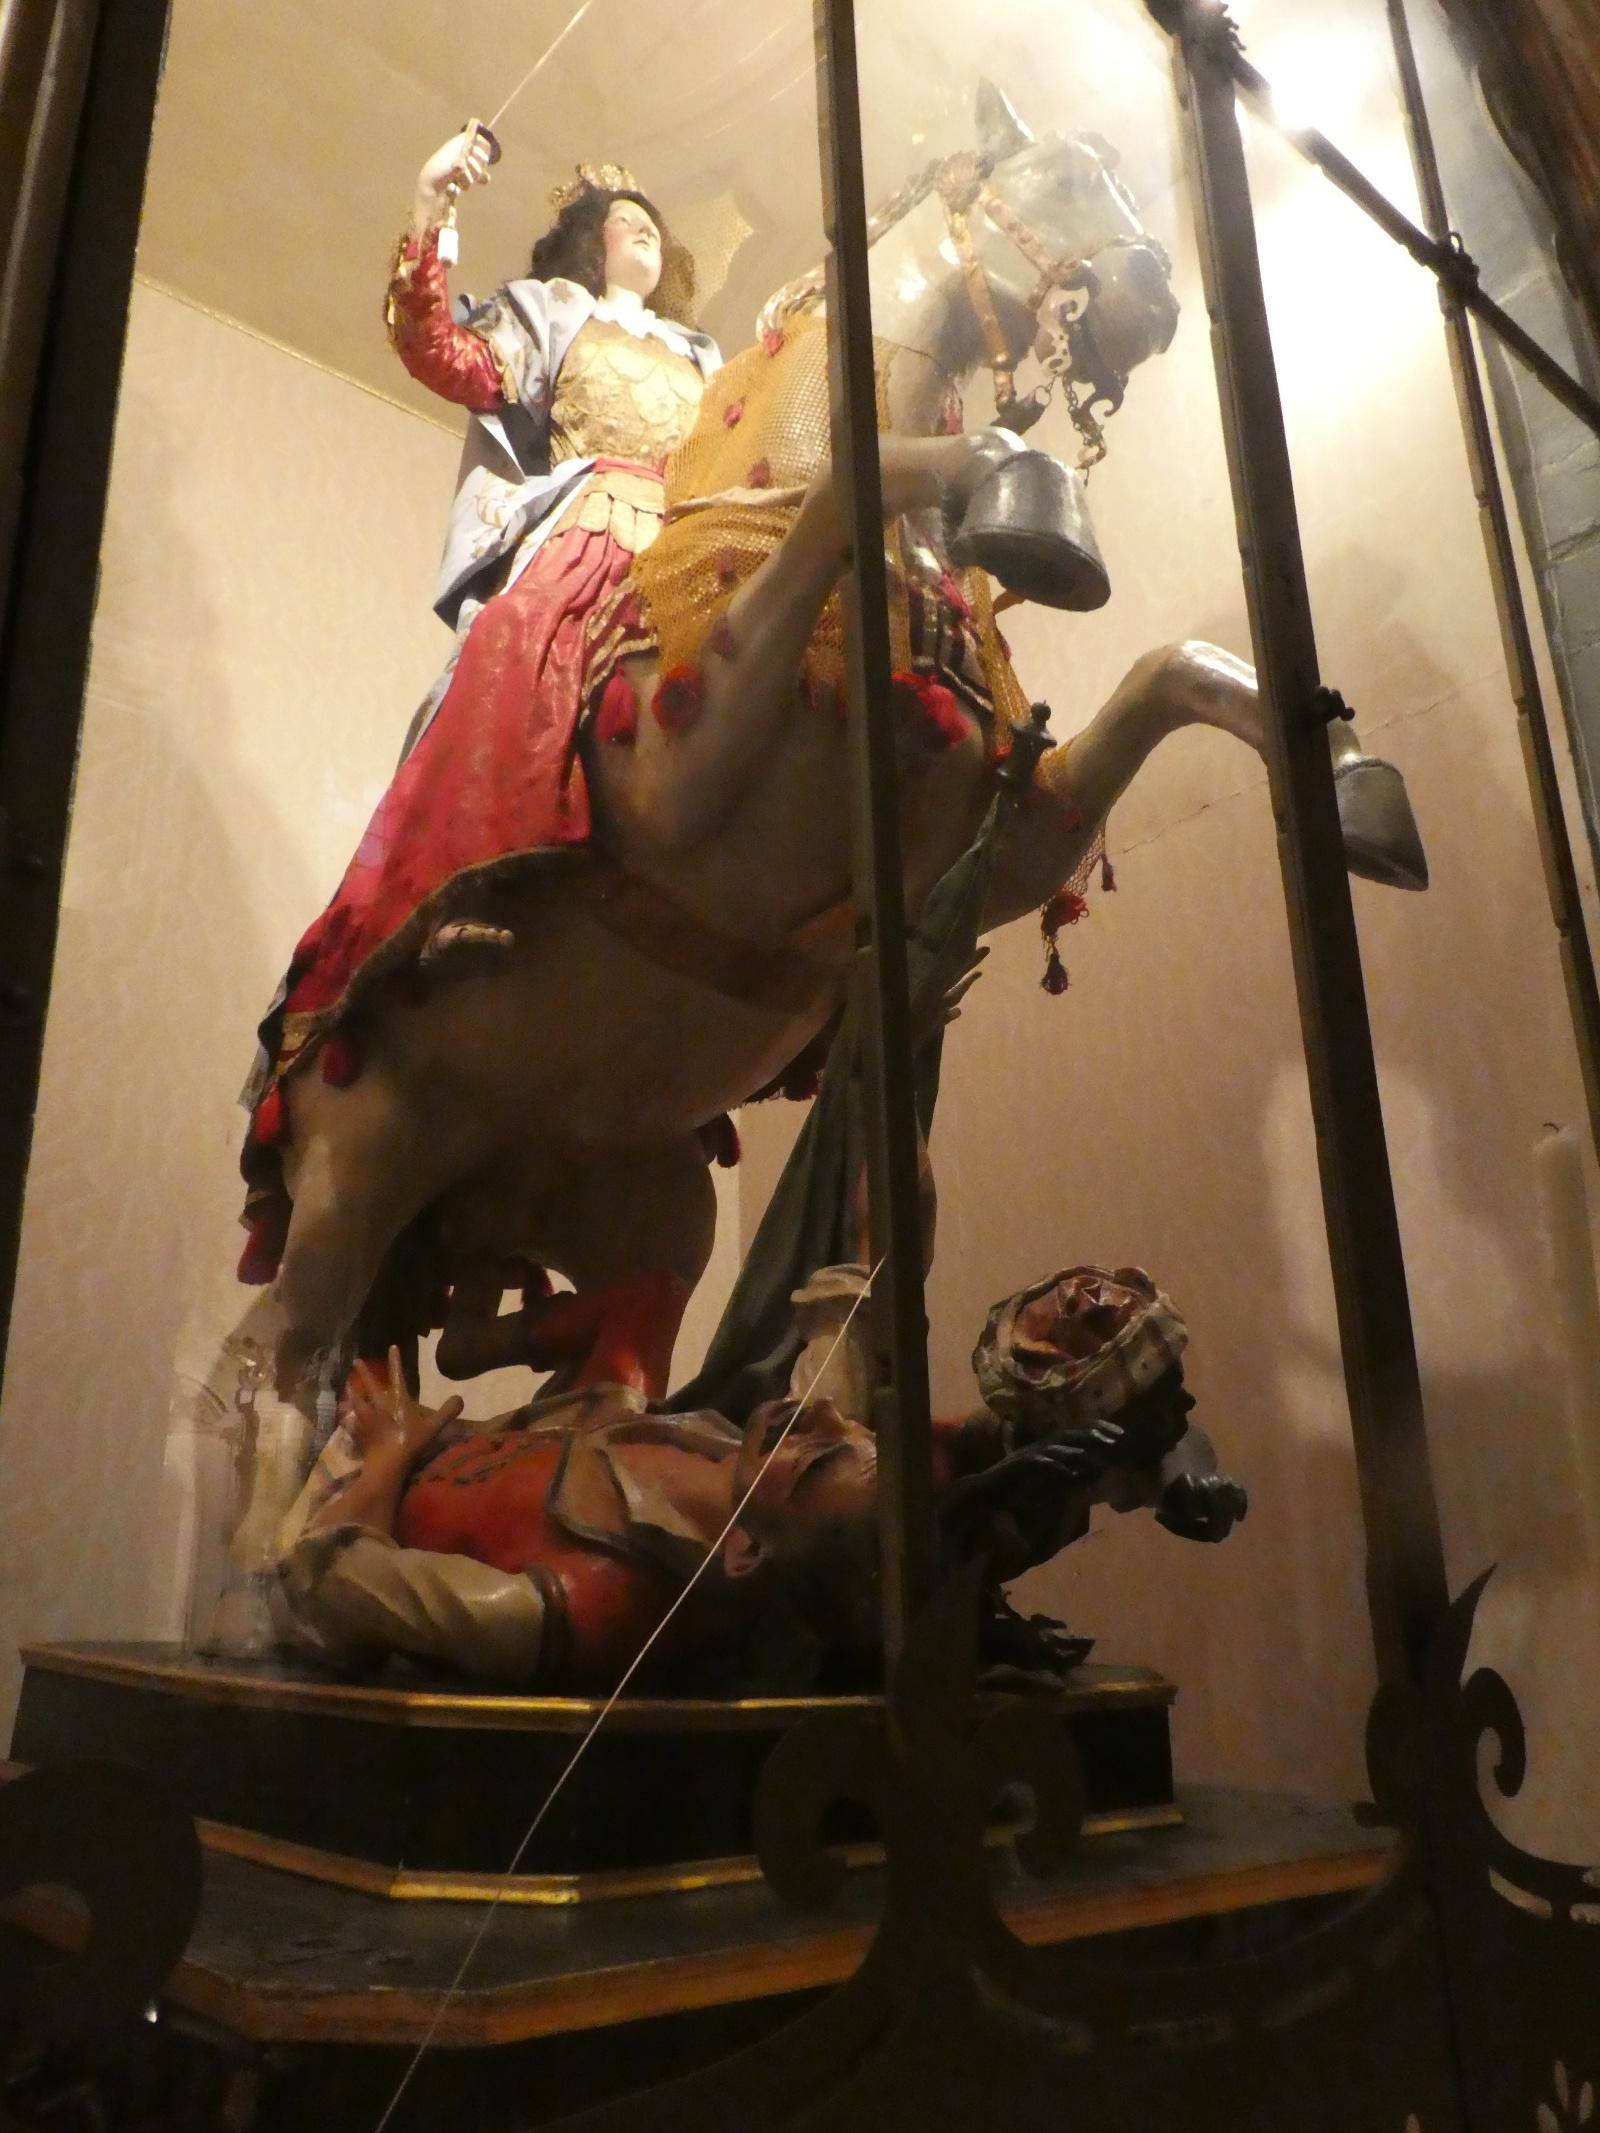 "Prozessionsfigur in der Chiesa Madre von Scicli.<br> Quelle: Fotografie von Achim Aurnhammer, 2016 <br>Lizenz: <a href=""https://creativecommons.org/licenses/by-sa/4.0/"">Creative Commons BY-SA 4.0</a>"